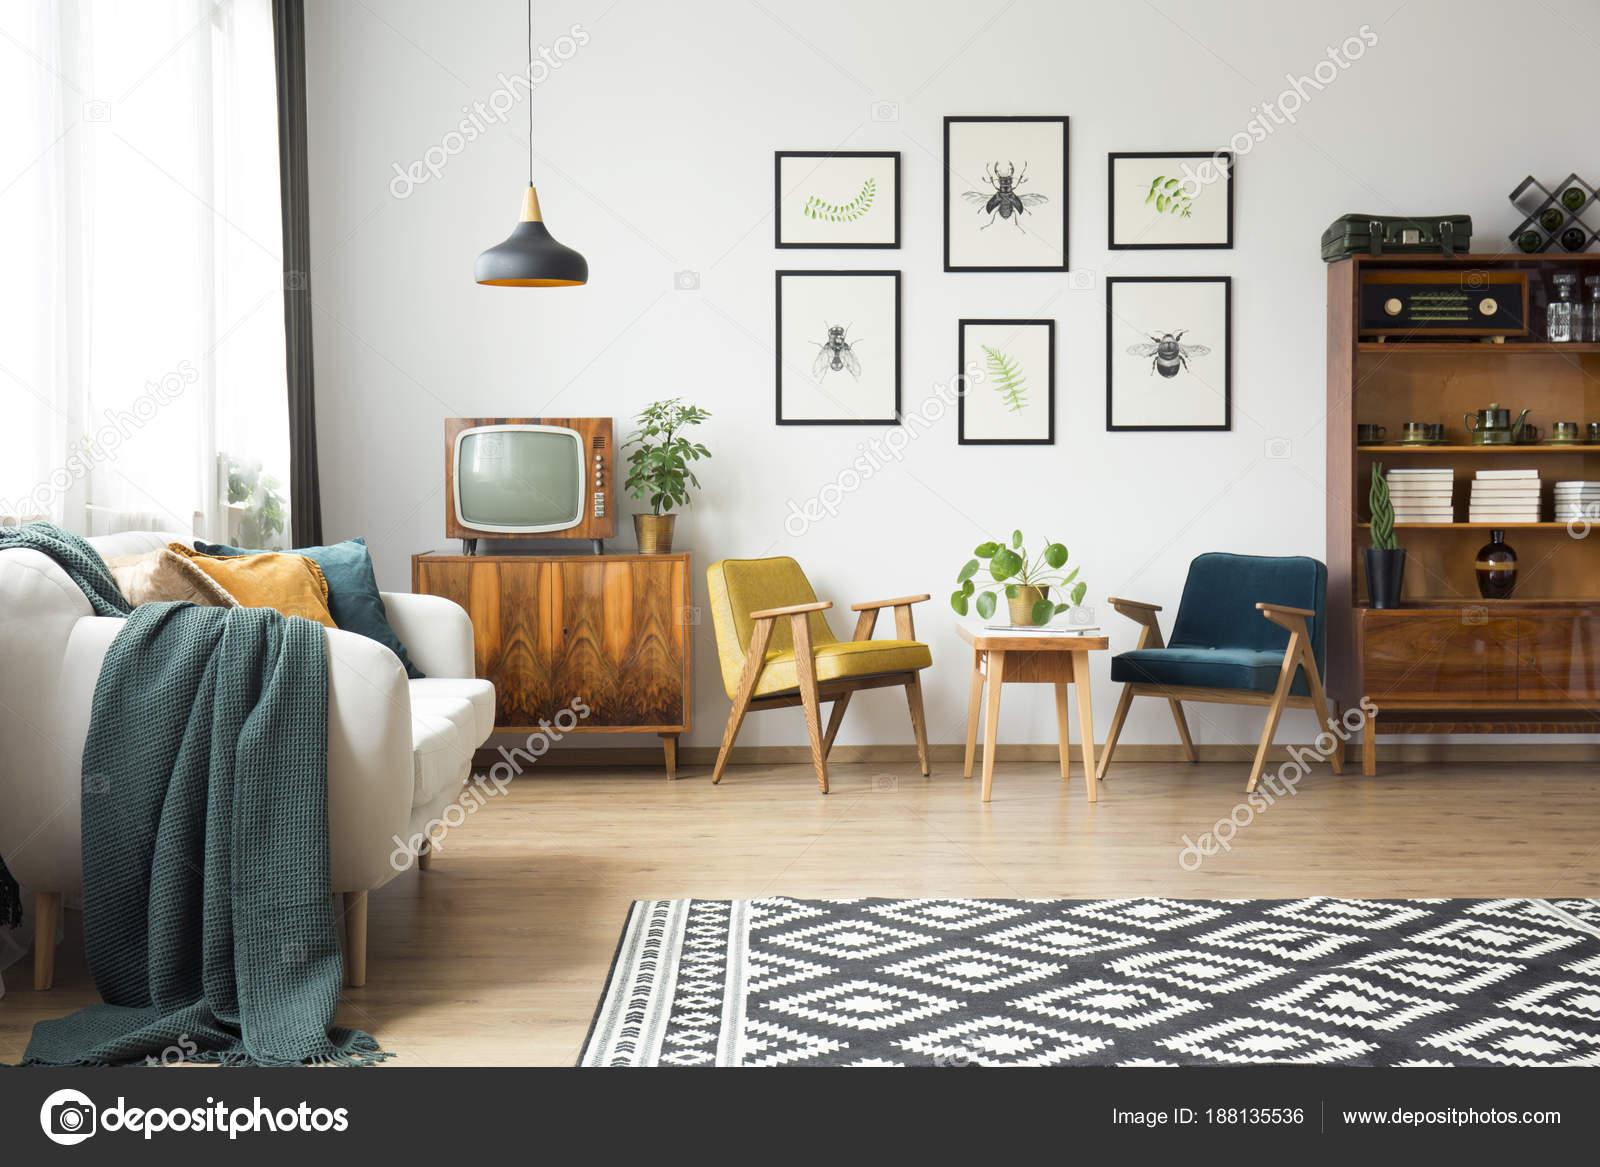 Vintage-Möbel in einem loft — Stockfoto © photographee.eu #188135536